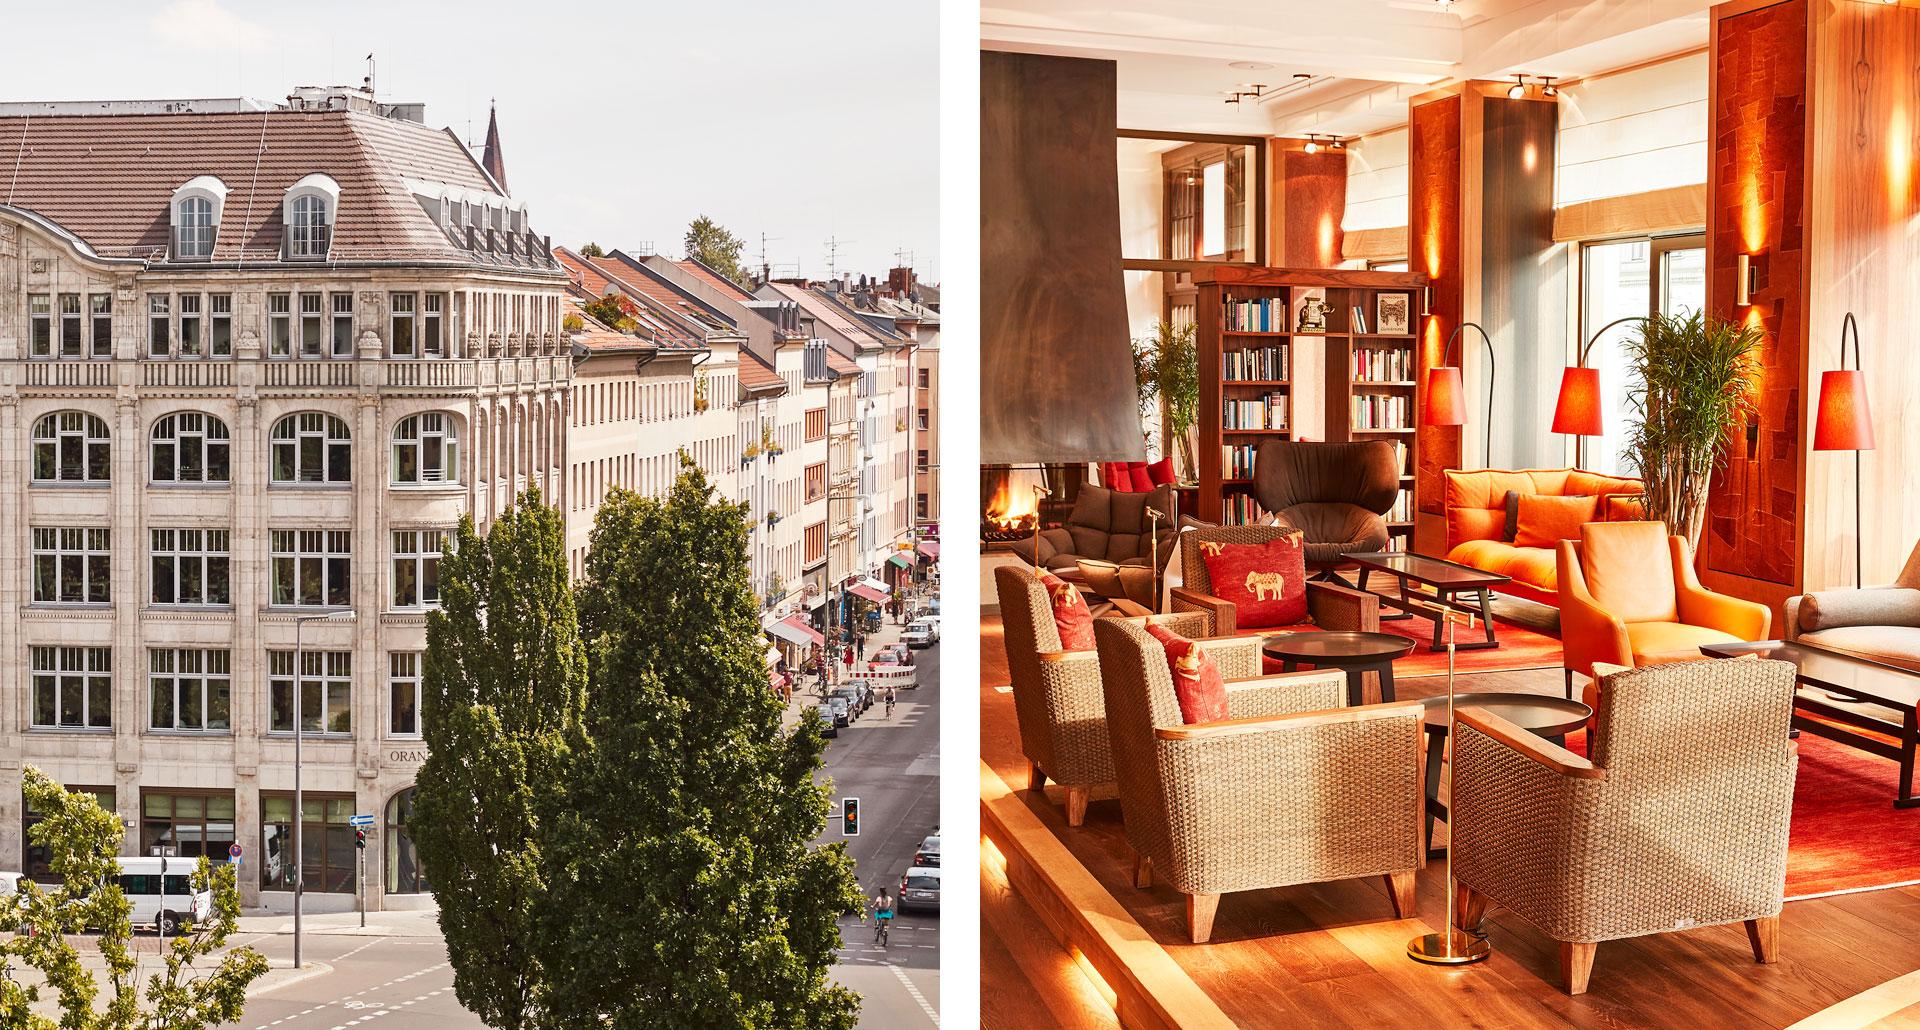 Hotel Orania.Berlin - boutique hotel in Berlin